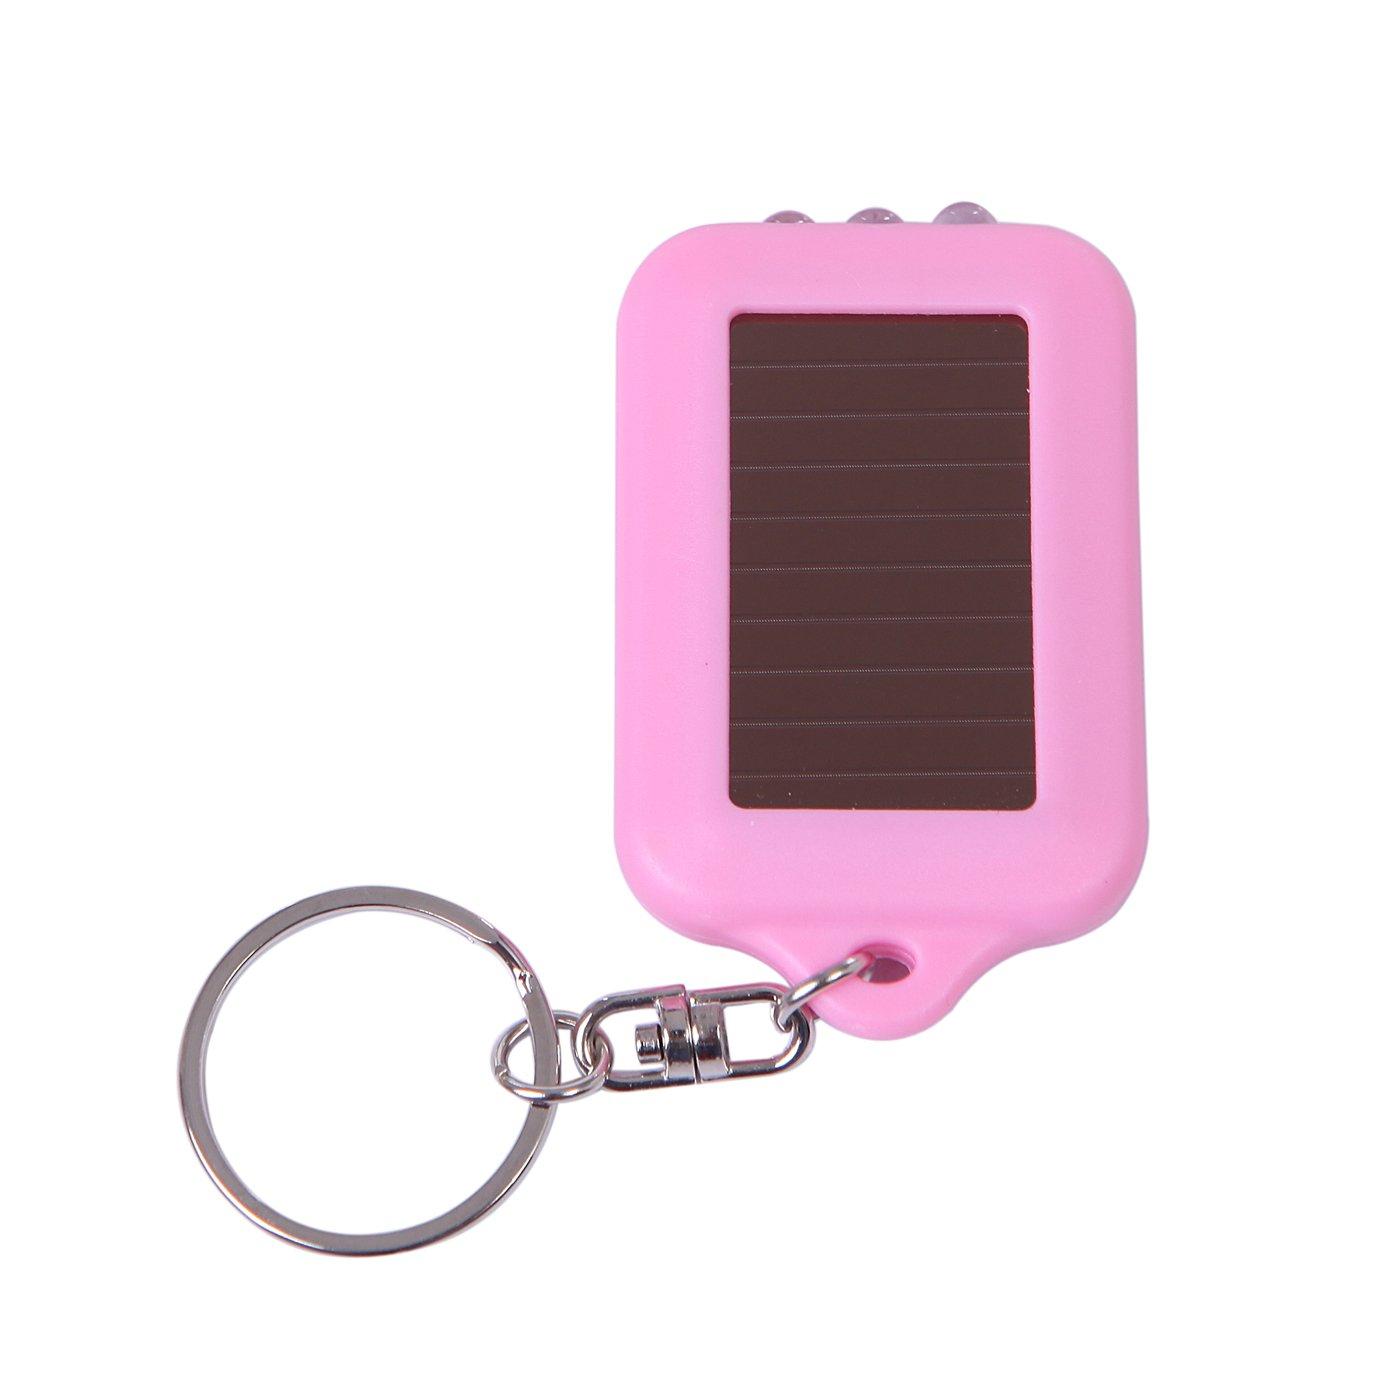 HDE 5x Emergency 3 LED Torch Flashlight Key Fob Solar Energy Power Keychain Lamp Light Black